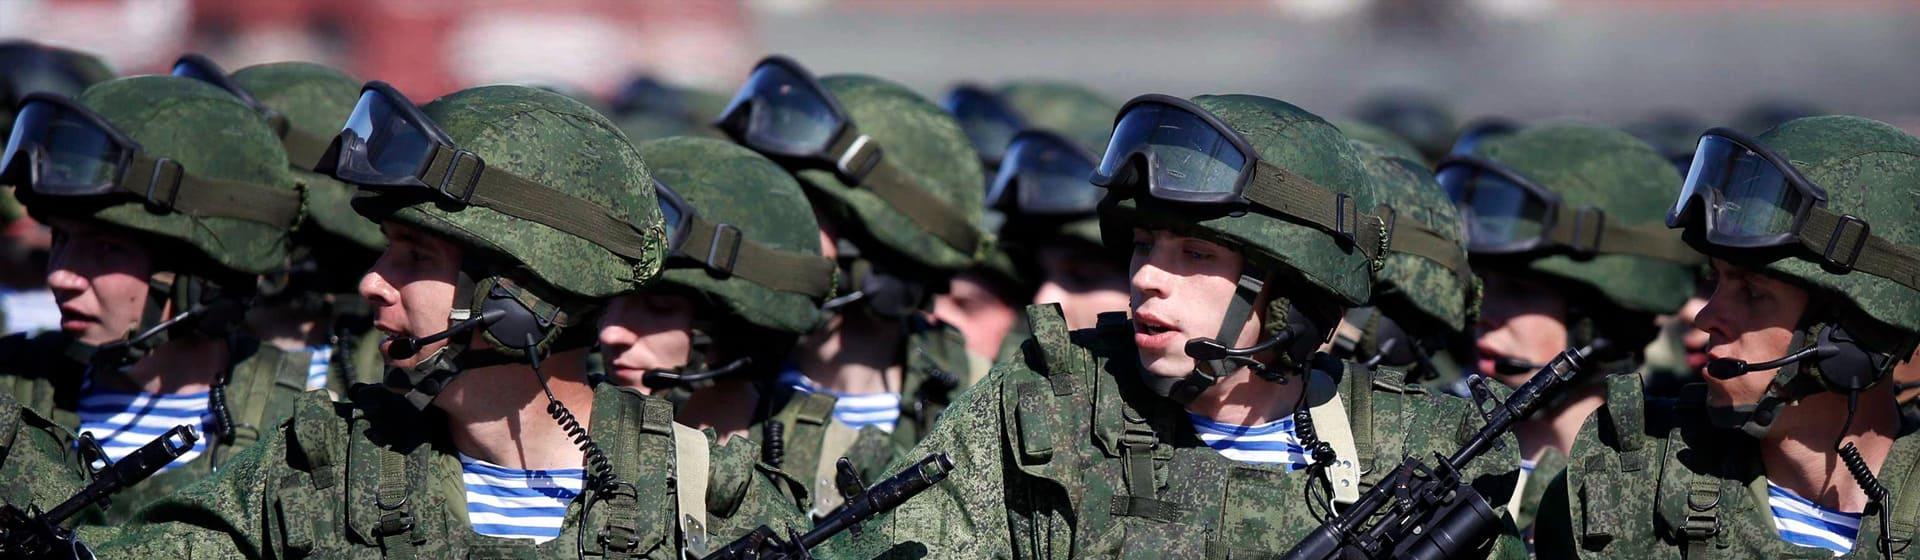 Армия - Детские юбки